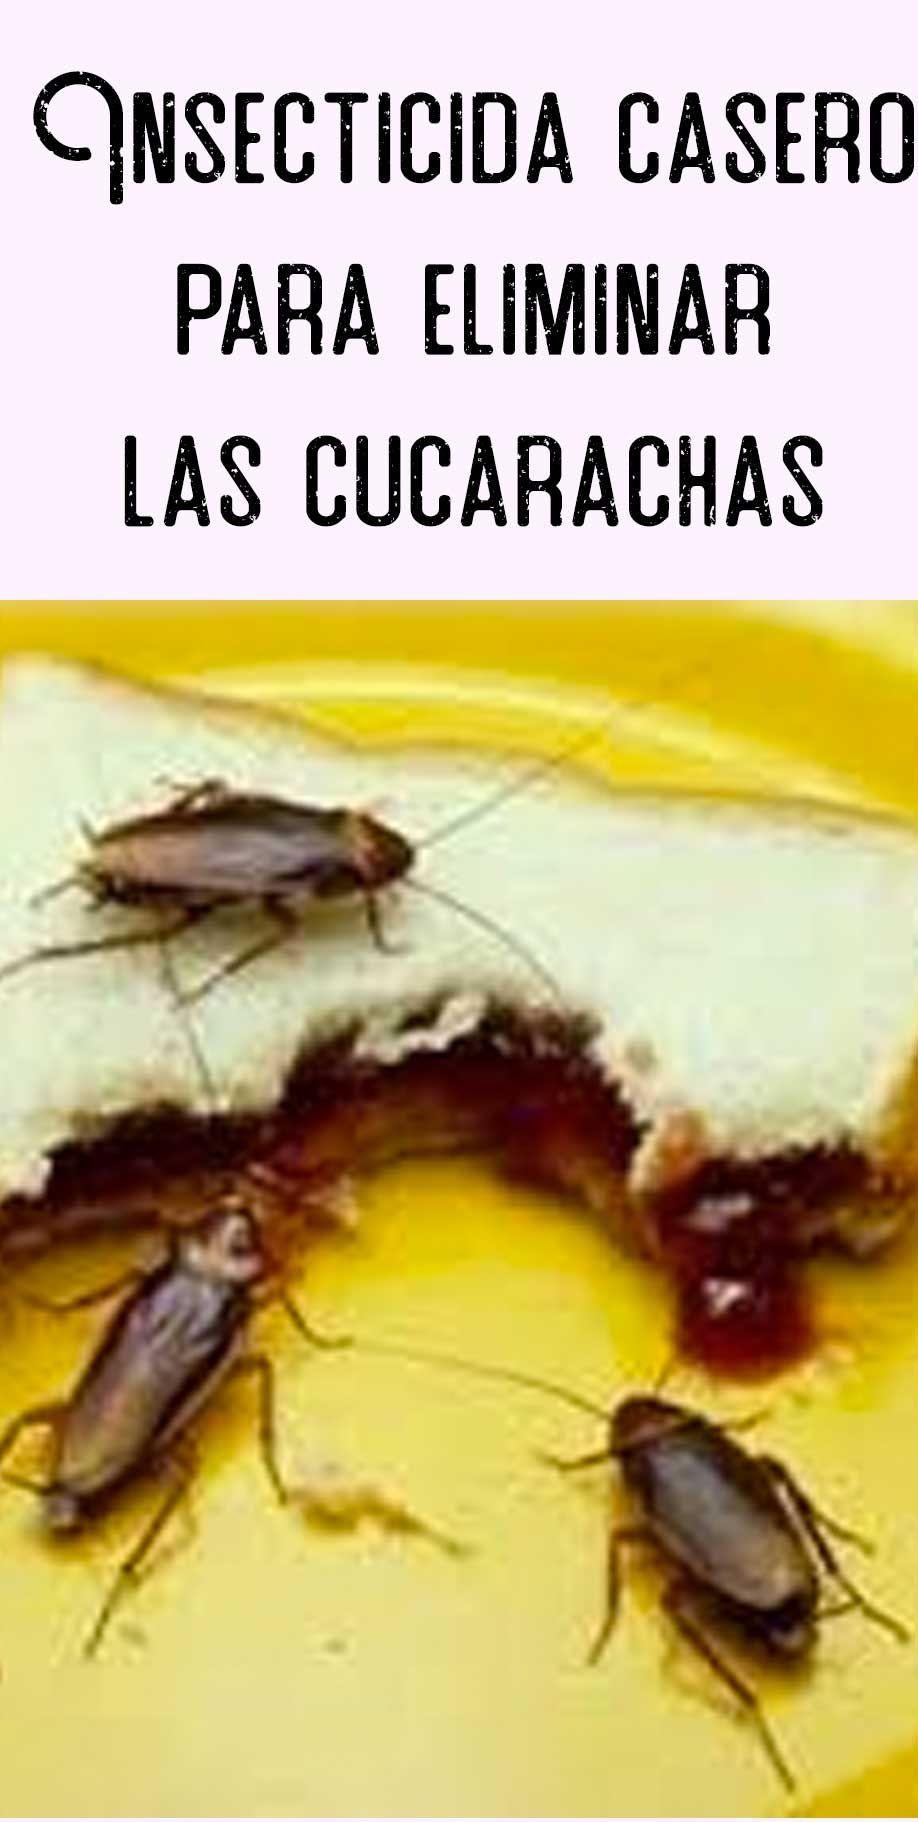 Como Acabar Con La Plaga De Cucarachas Chiquitas Pin En Insecticidas